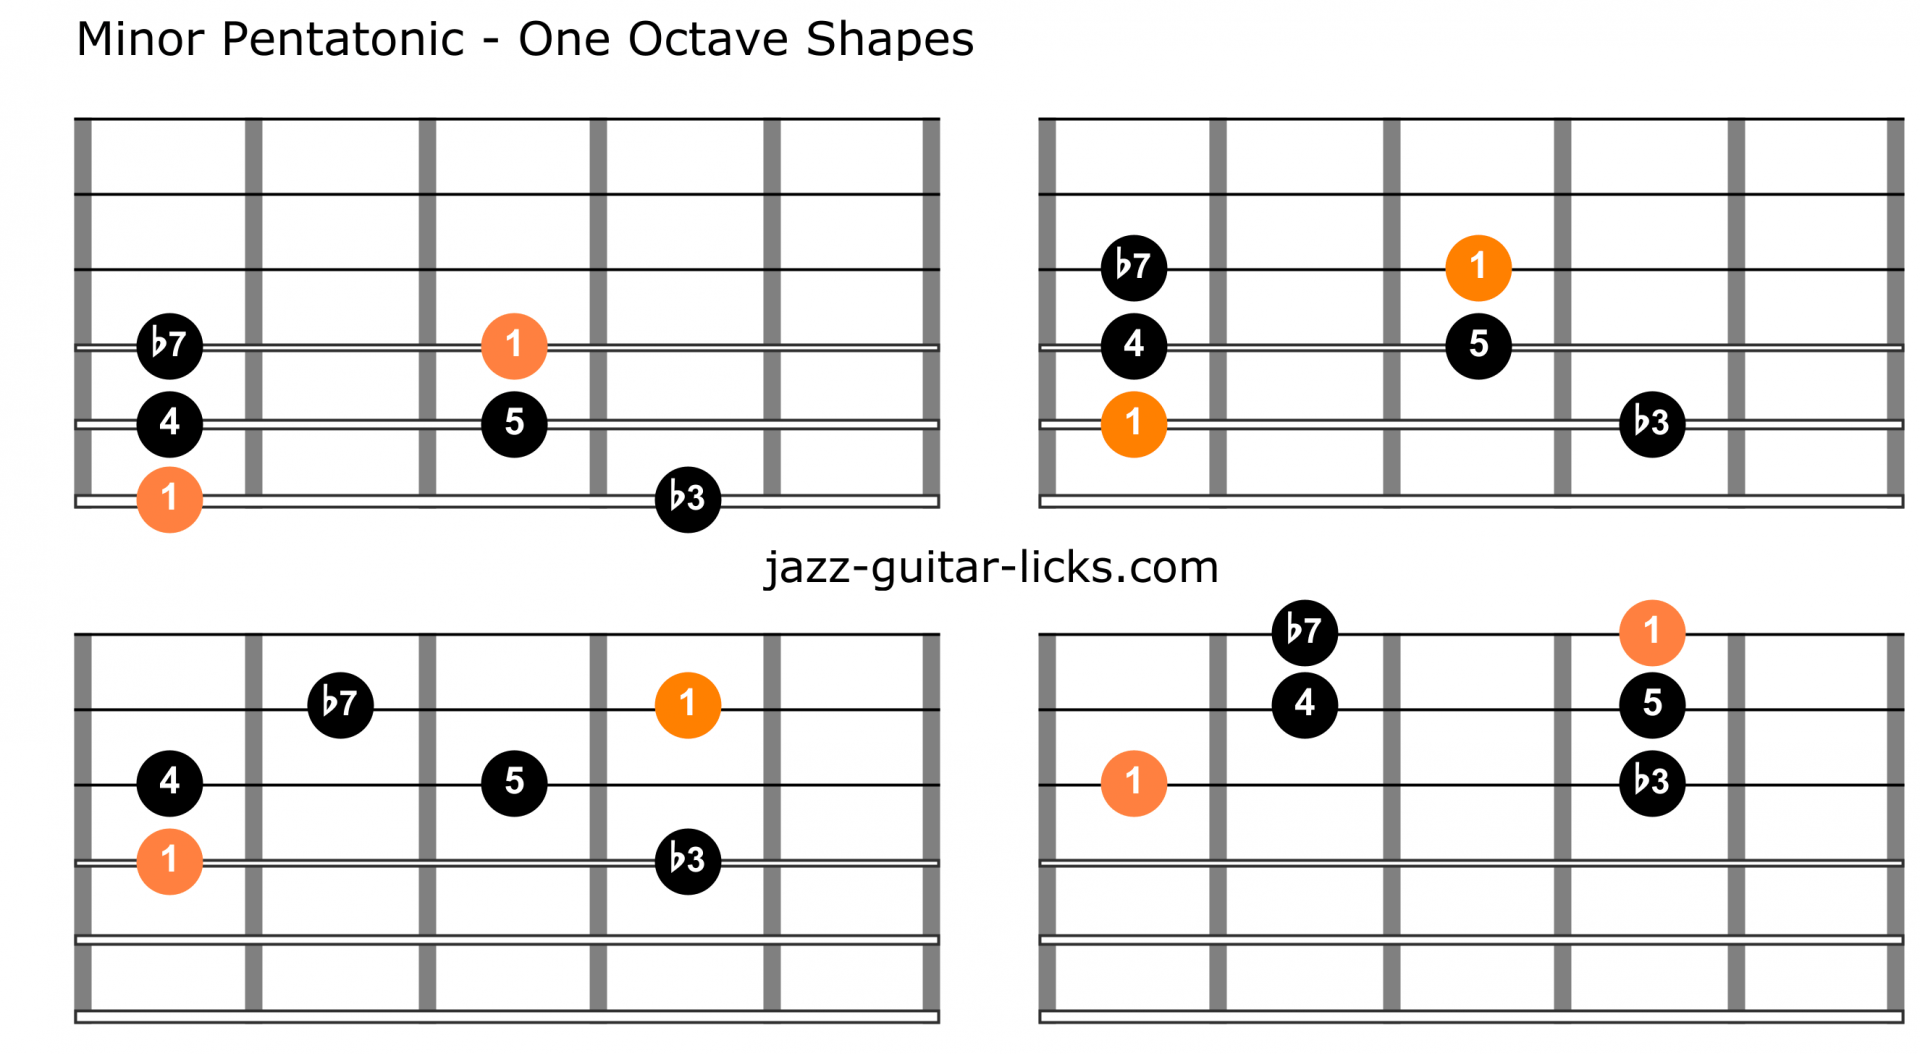 Minor pentatonic scale guitar charts